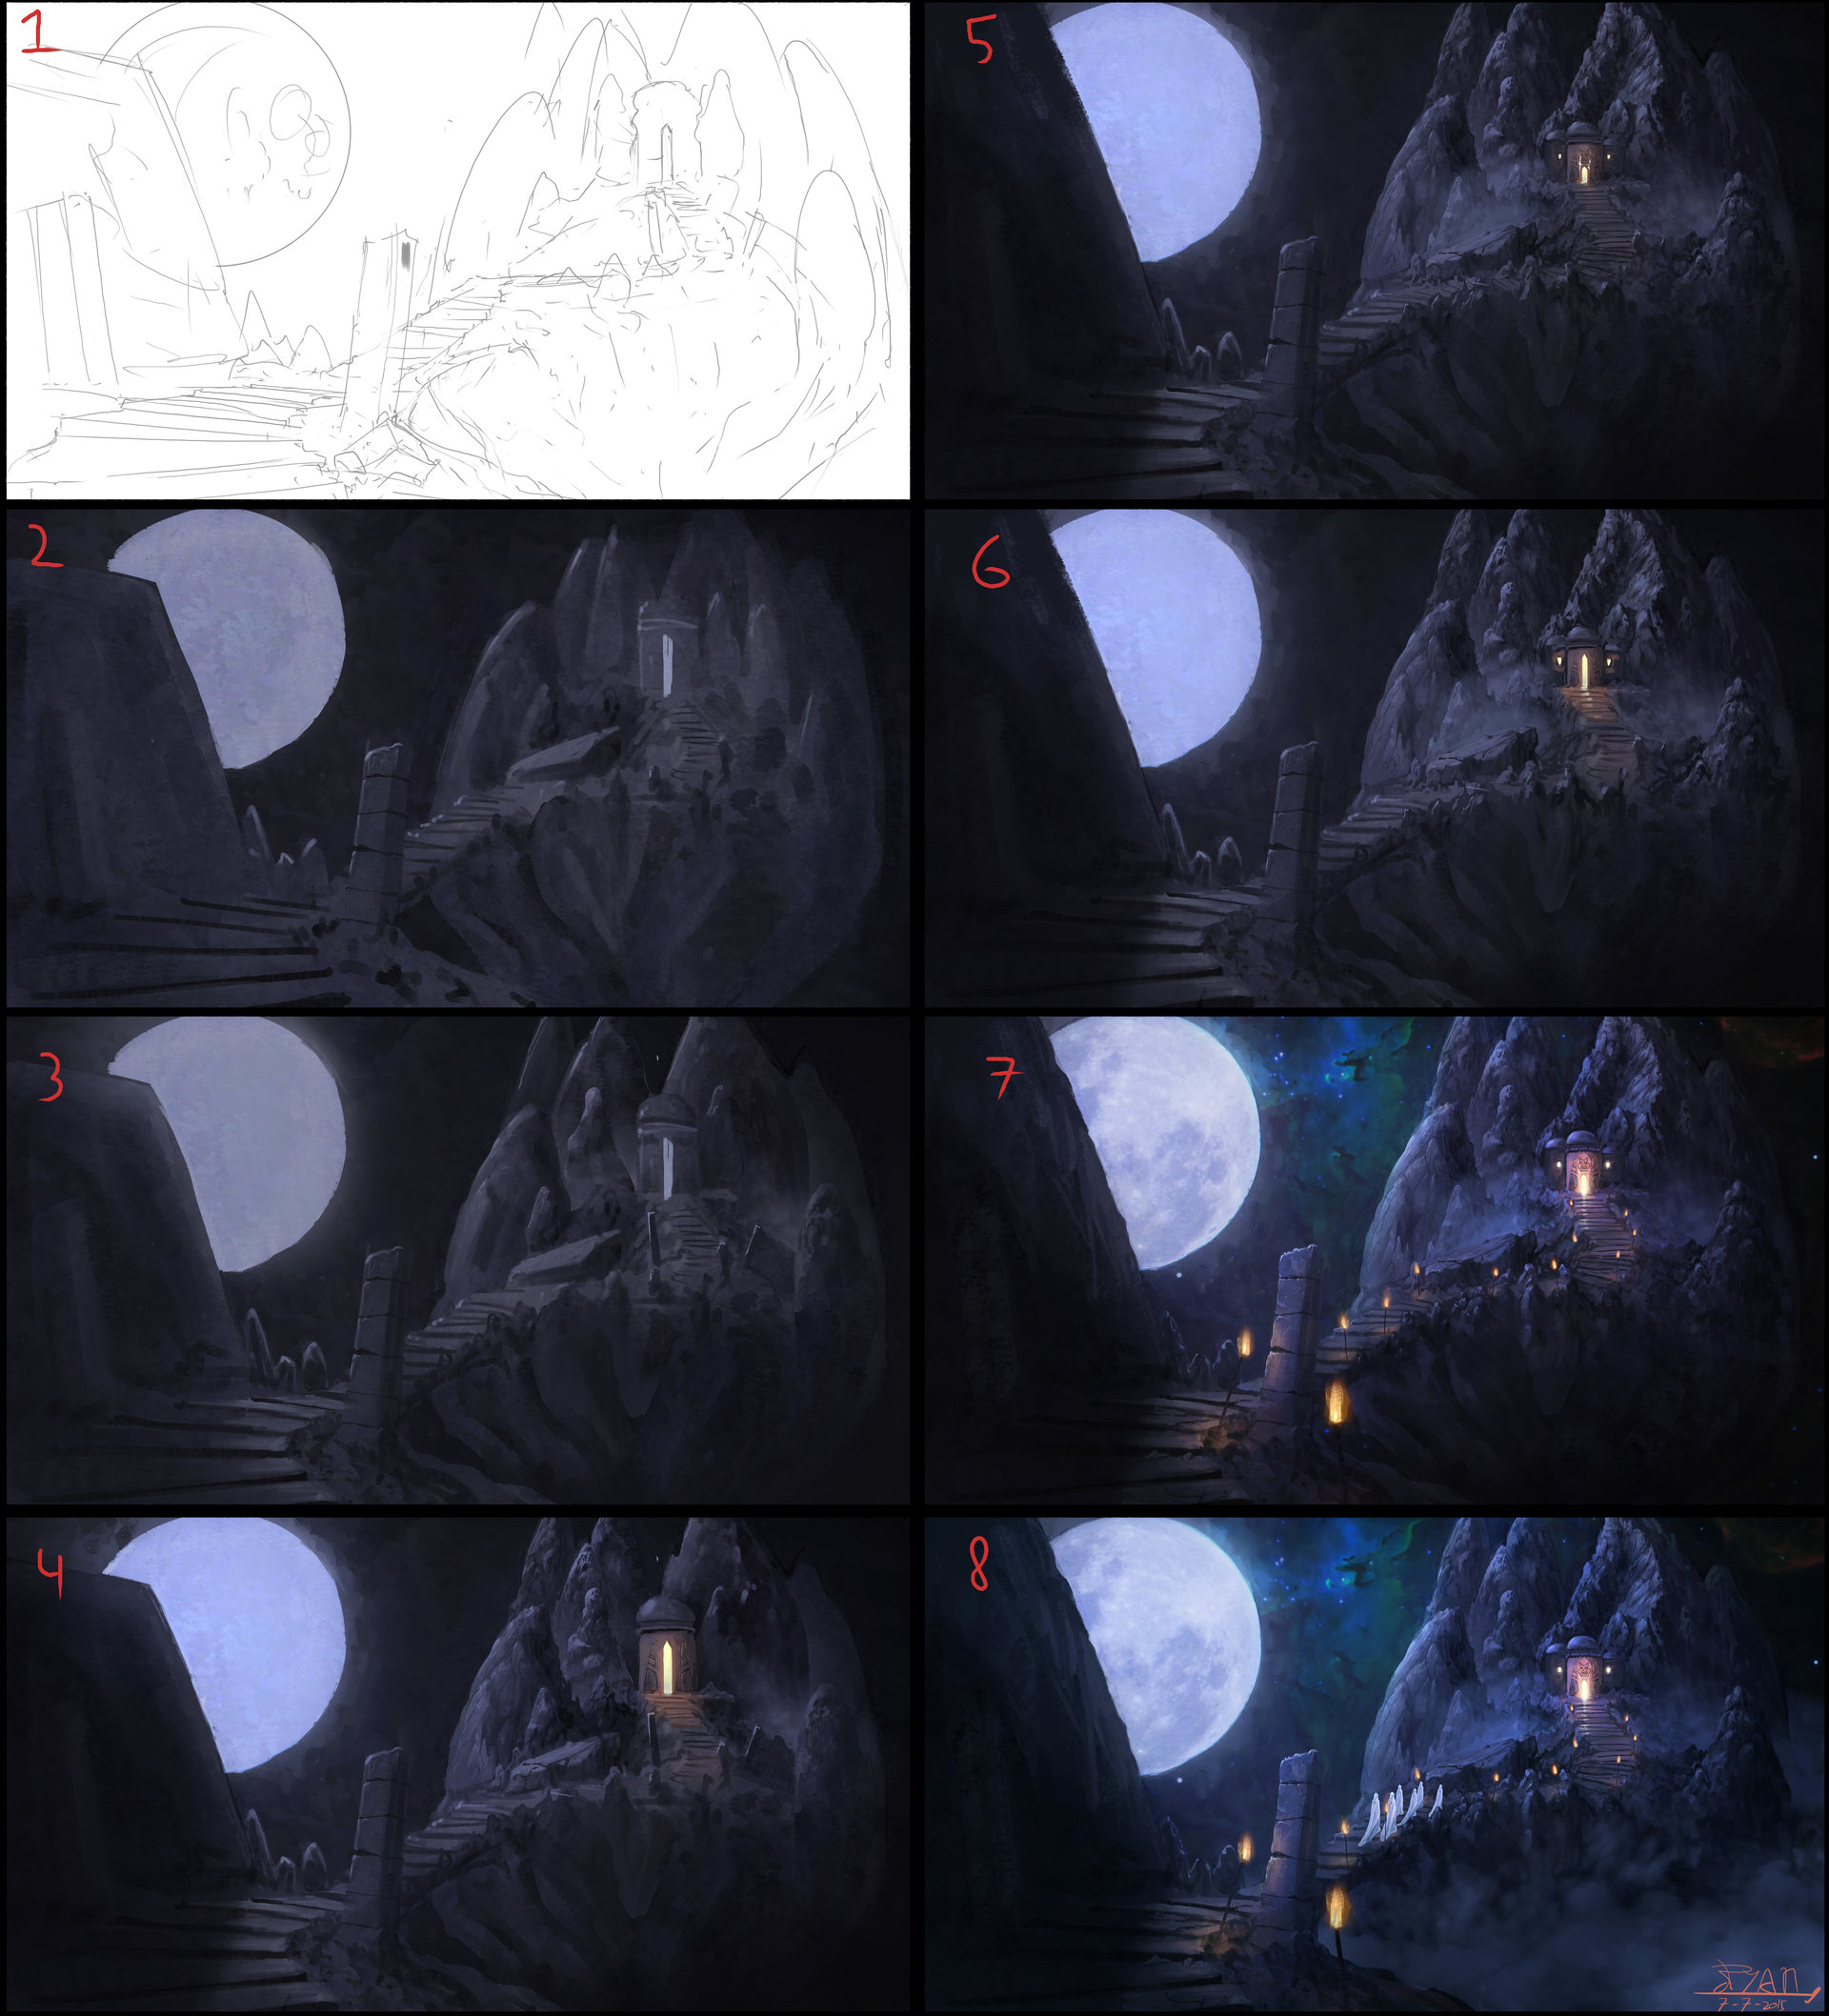 Ryan groskamp the moon observatory progress